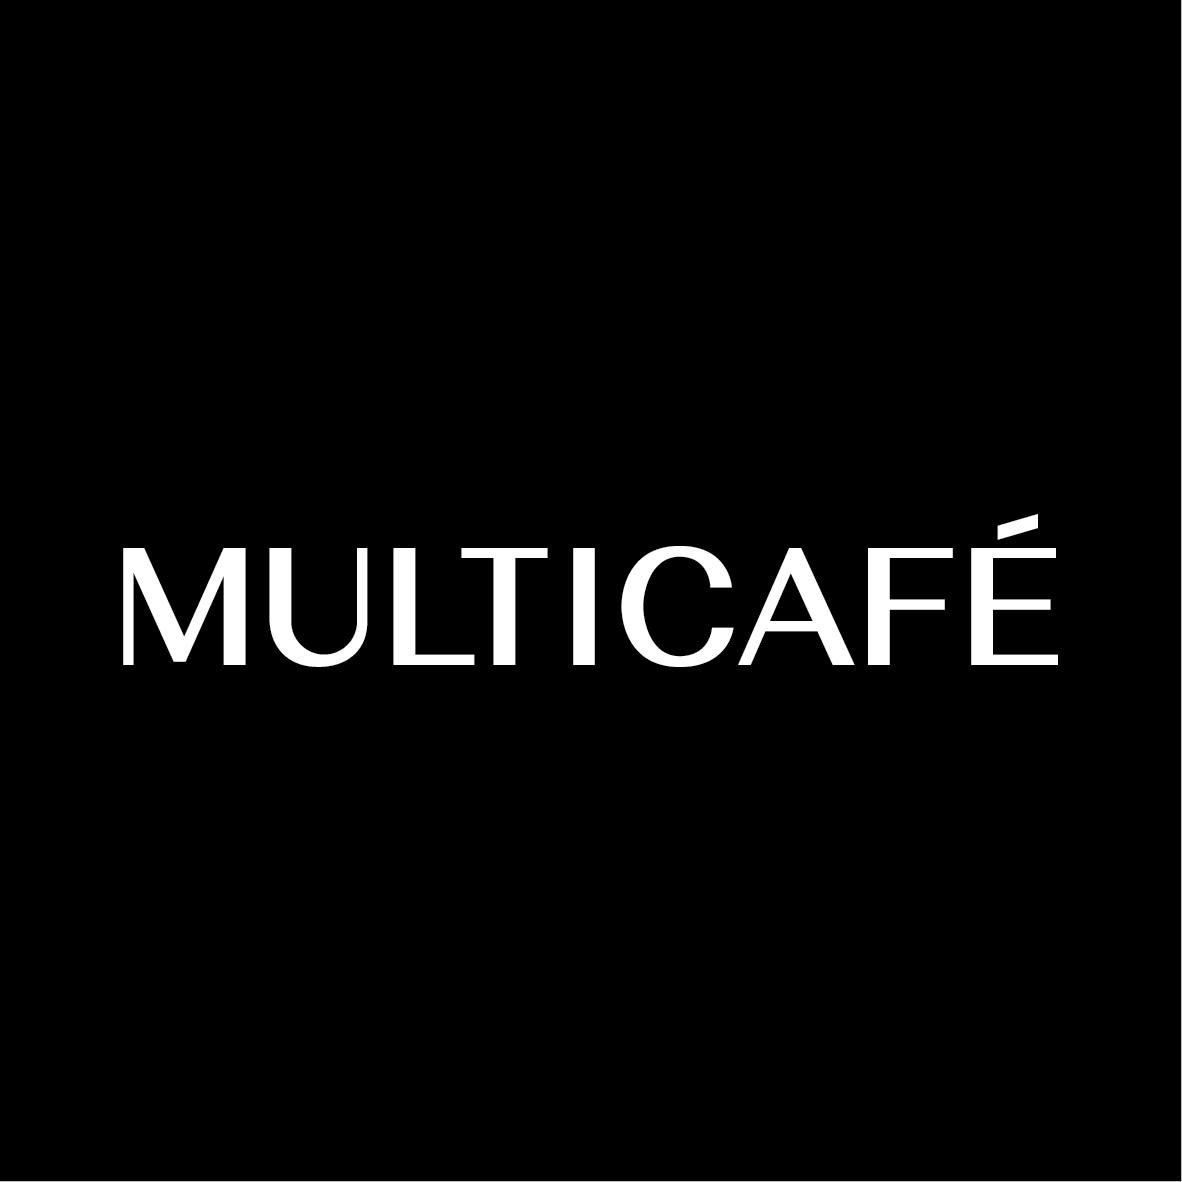 MultiCafe